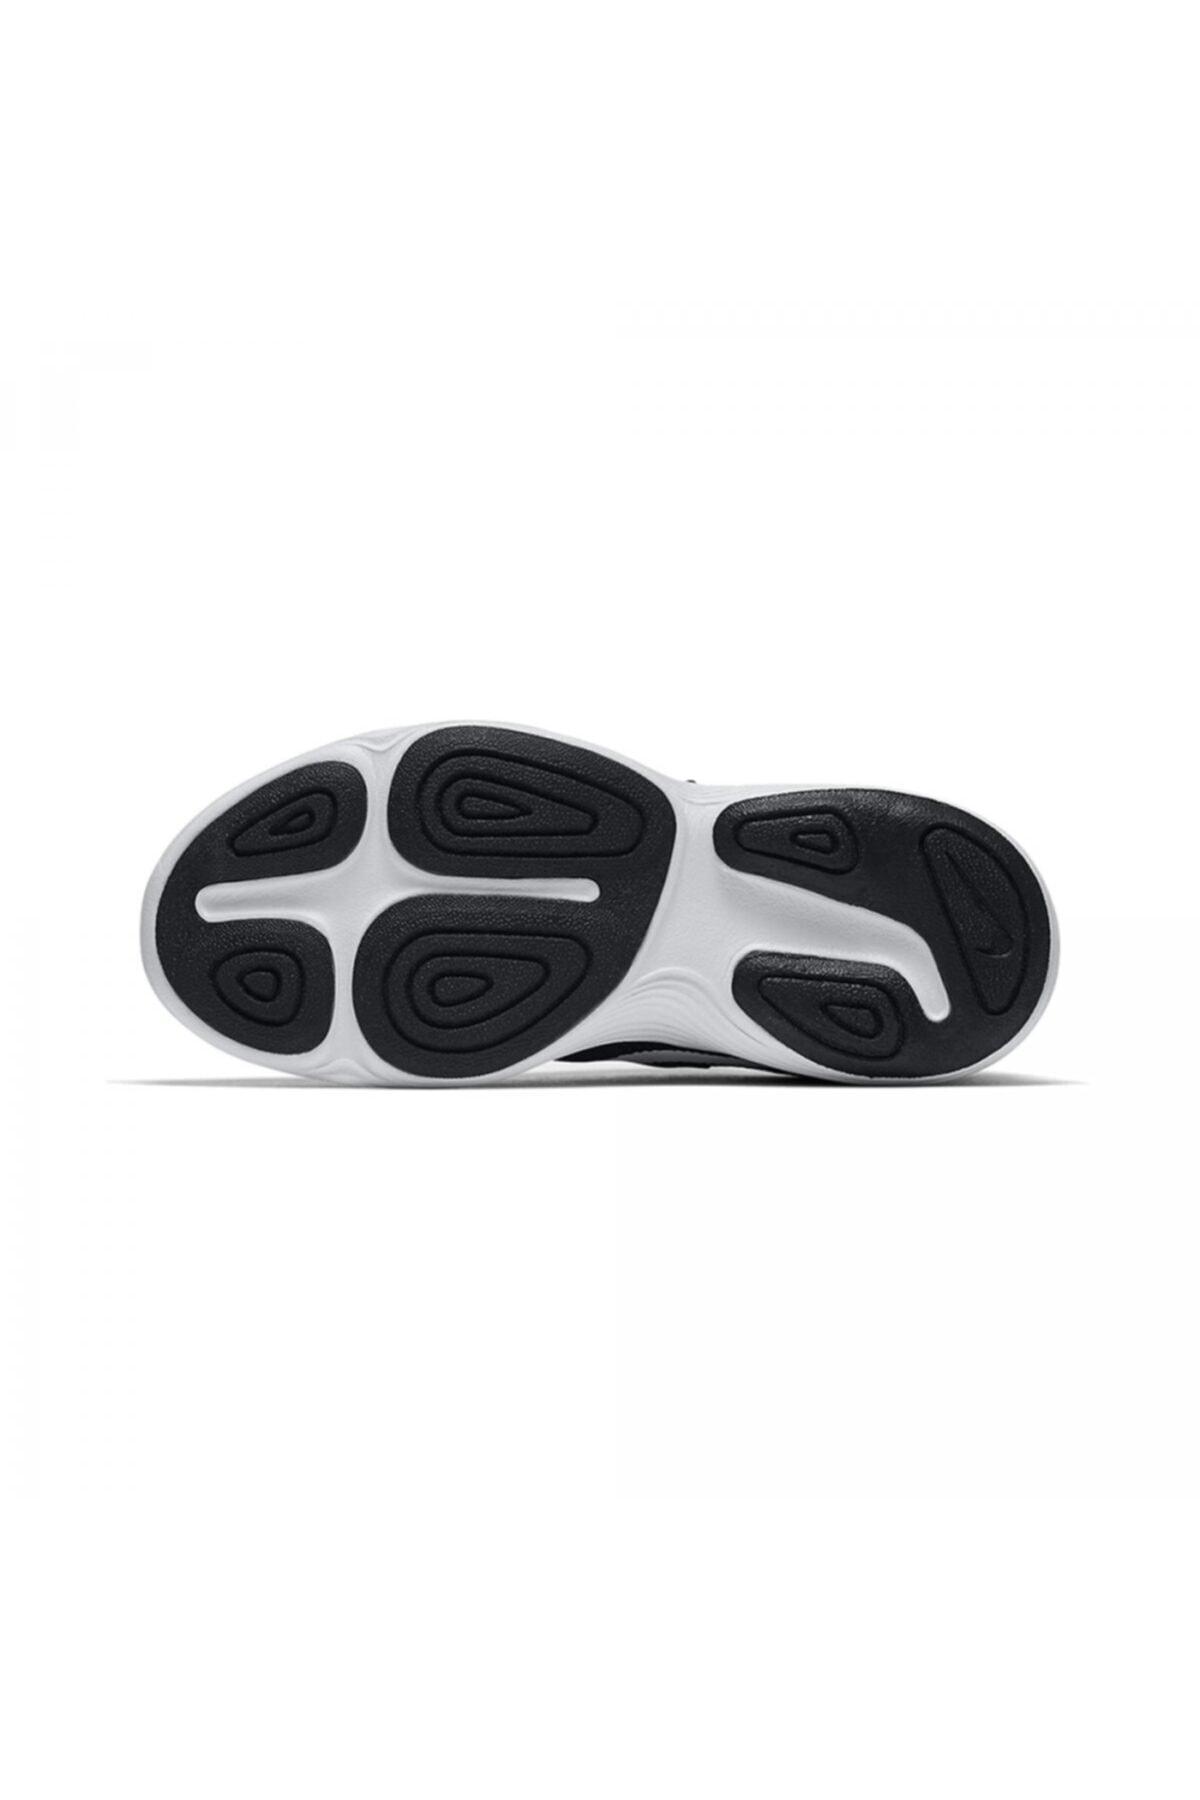 Nike Kids Bebek Siyah Koşu Ayakkabı 943305-006 2